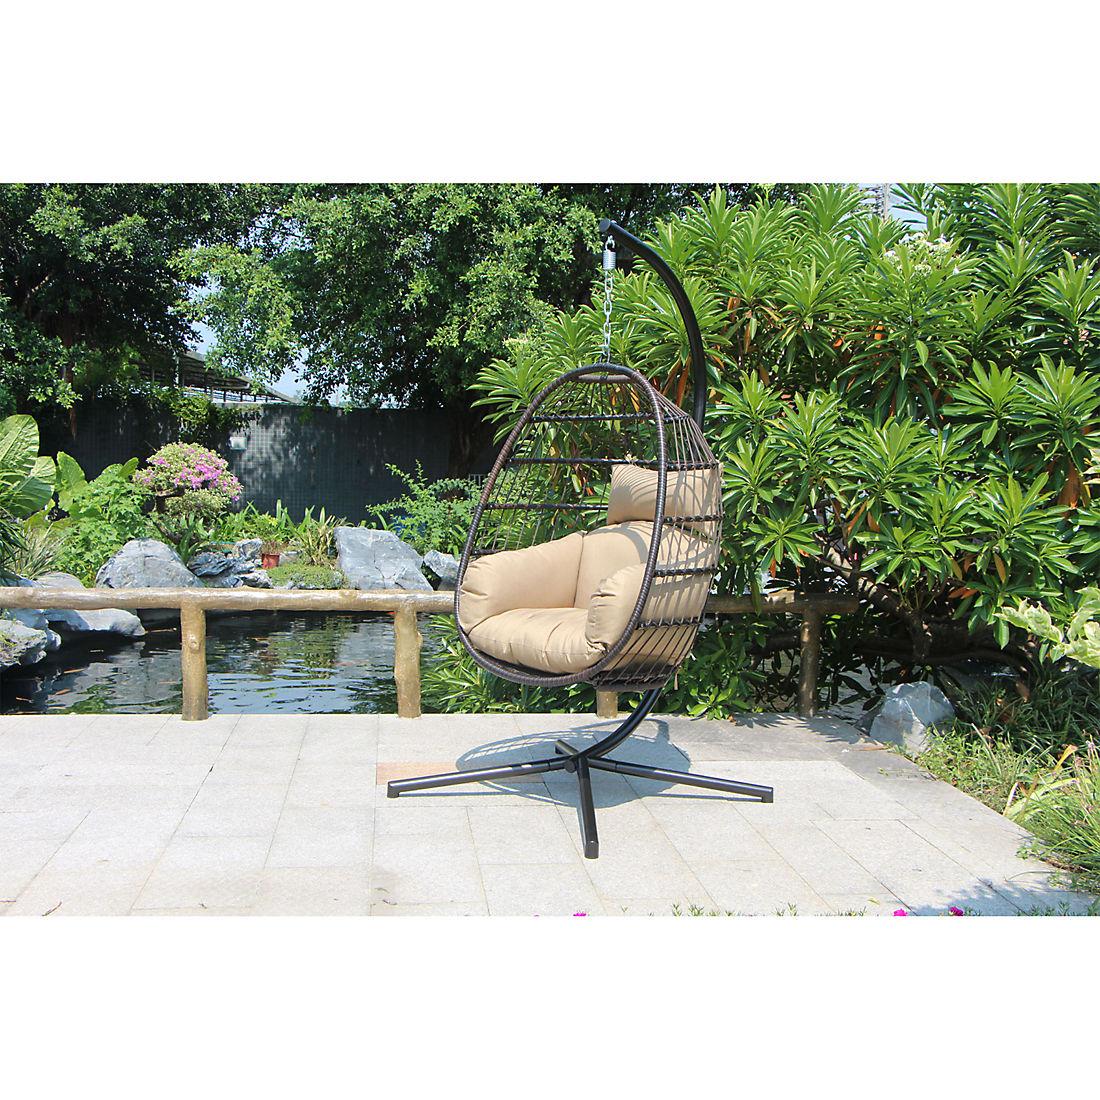 Tremendous Berkley Jensen Wicker Hanging Egg Chair Dark Gray Cjindustries Chair Design For Home Cjindustriesco